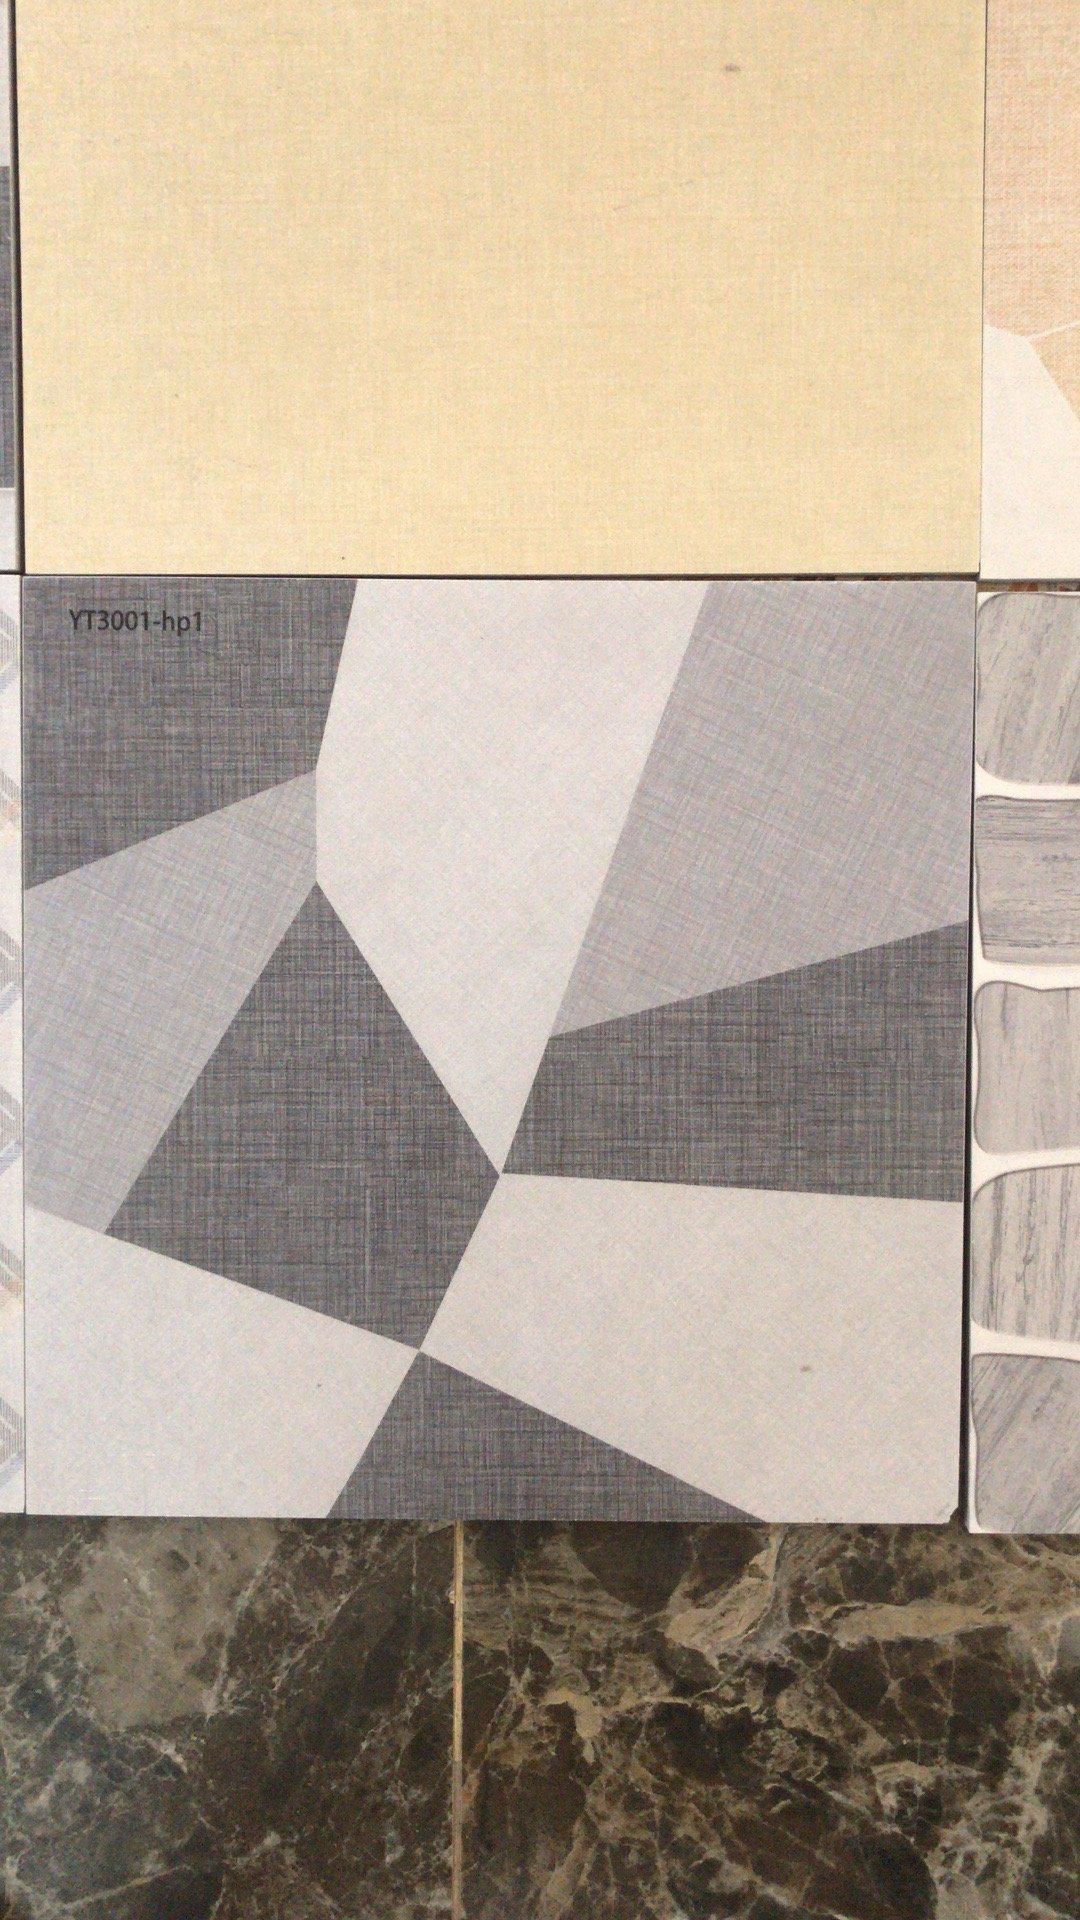 600x600 multi patterns carpet tile for